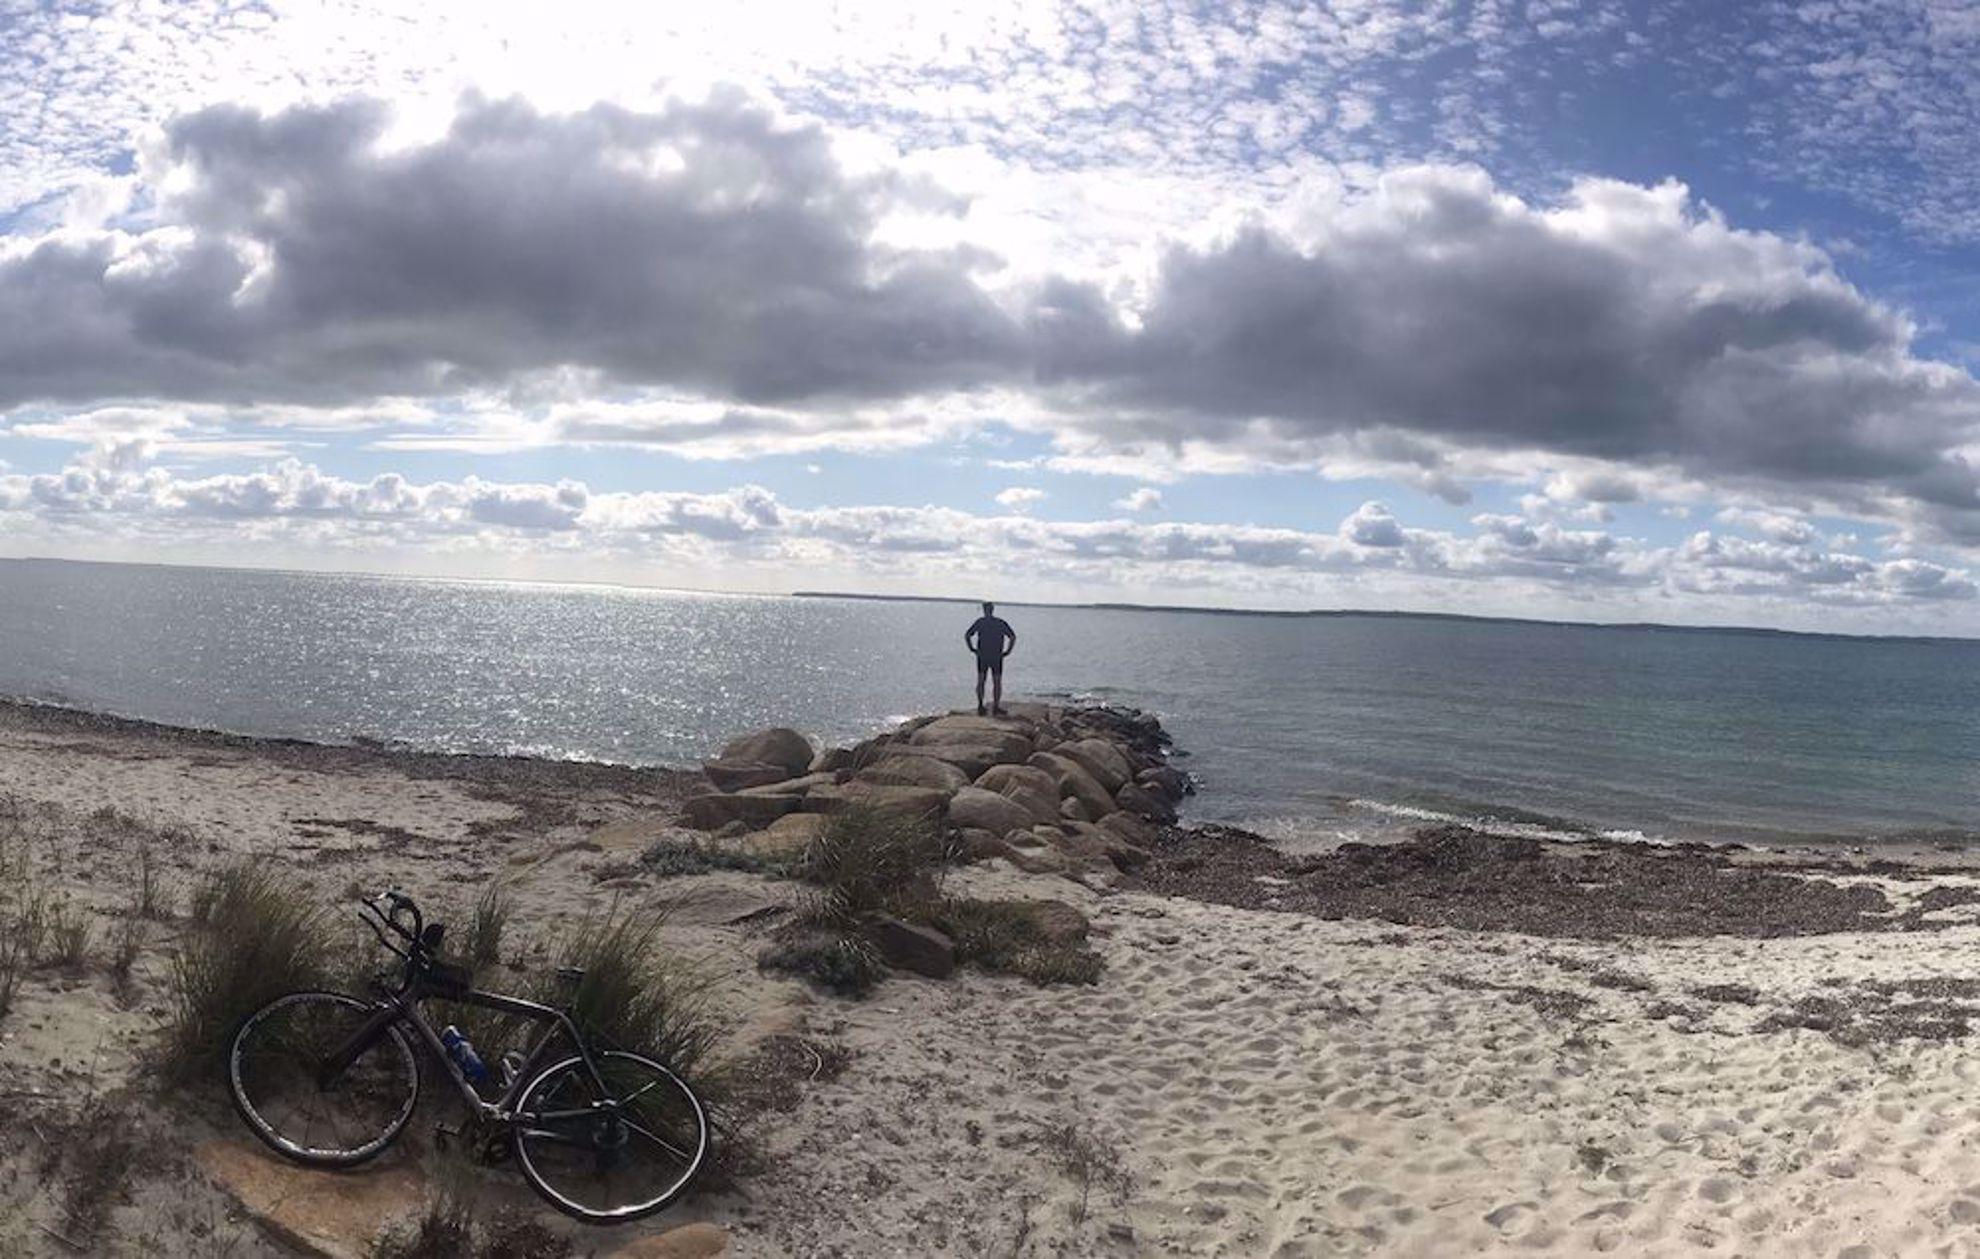 Bicyclist on beach